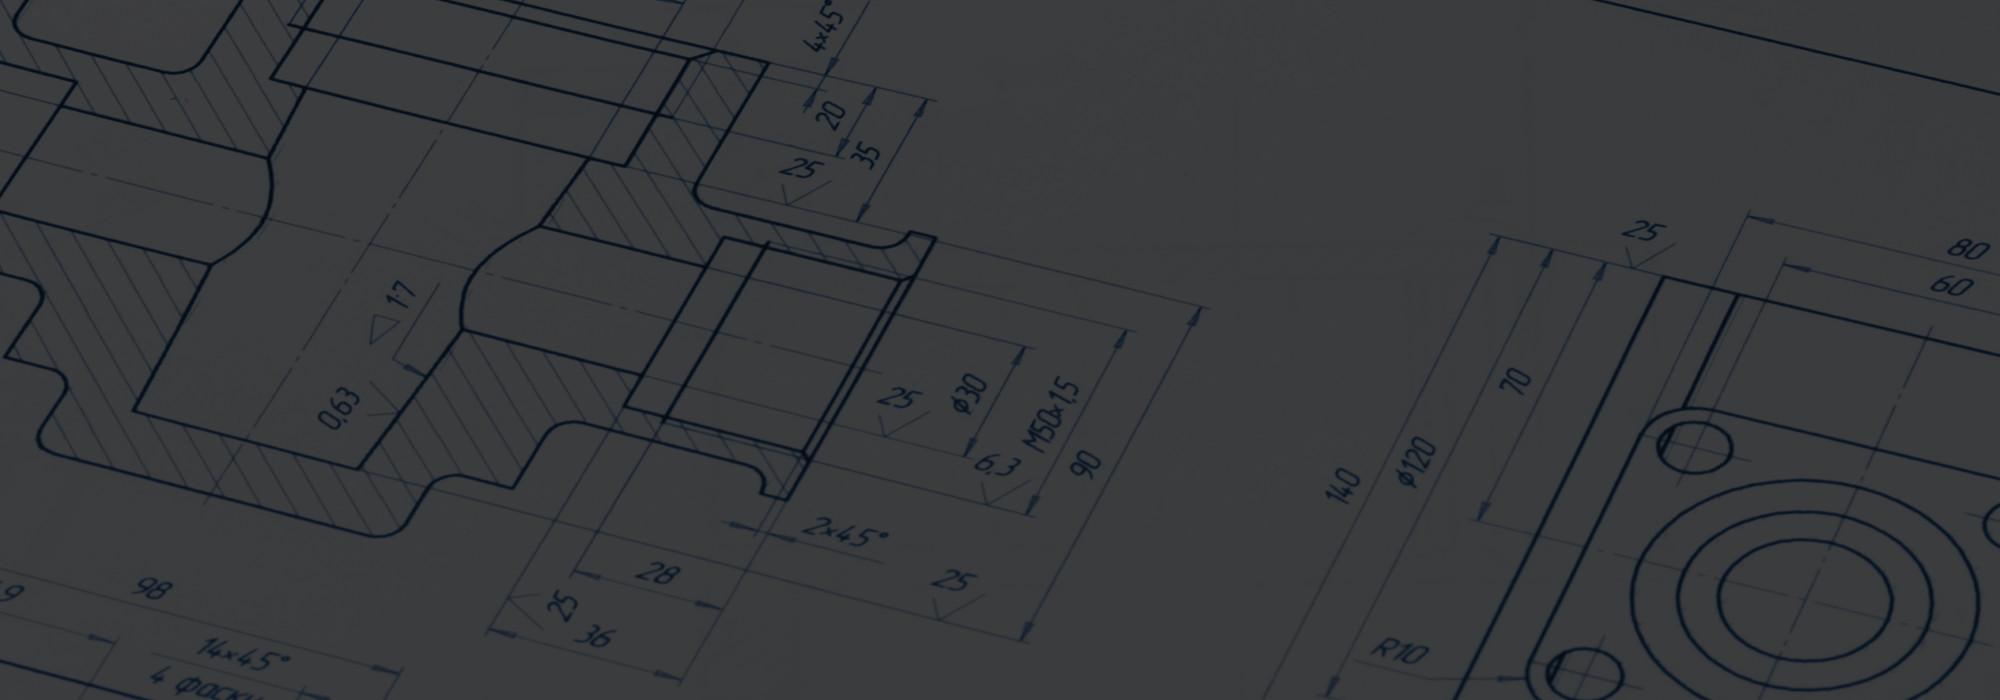 hight resolution of 1467995439 mc pid 37 requestschematics rv wiring diagram rv plumbing diagram request monaco